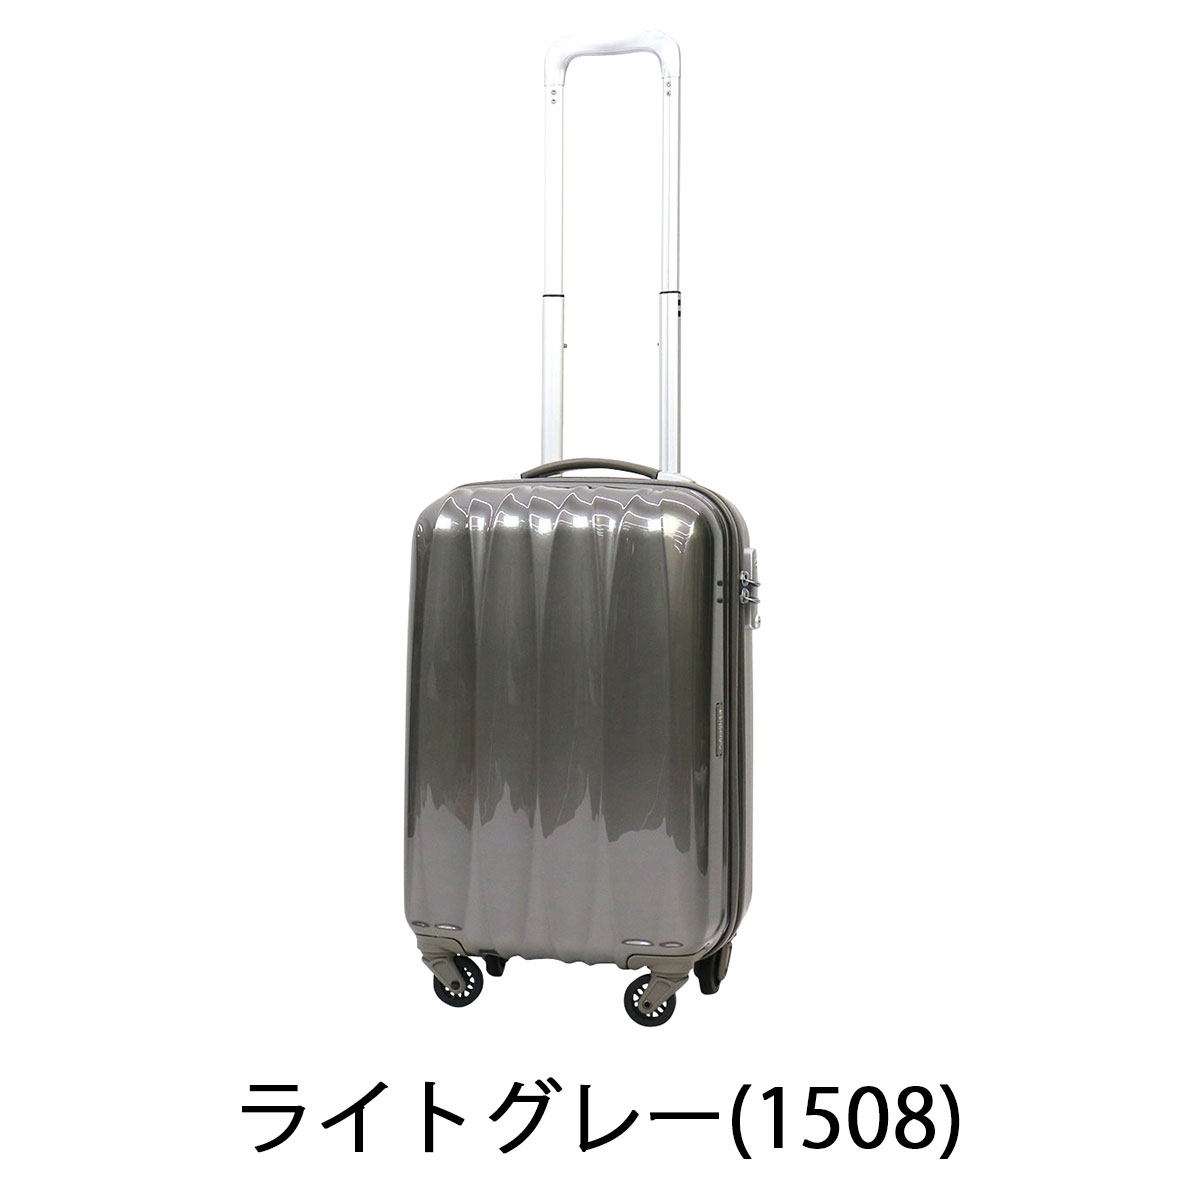 db60d74037 ... Lite/アローナ/スーツケース/キャリーケース/キャリーバッグ/ファスナー/ハードケース/32L/機内持ち込み/小型/Sサイズ/TSAロック/ 4輪/旅行バッグ/旅行カバン/旅行/ ...